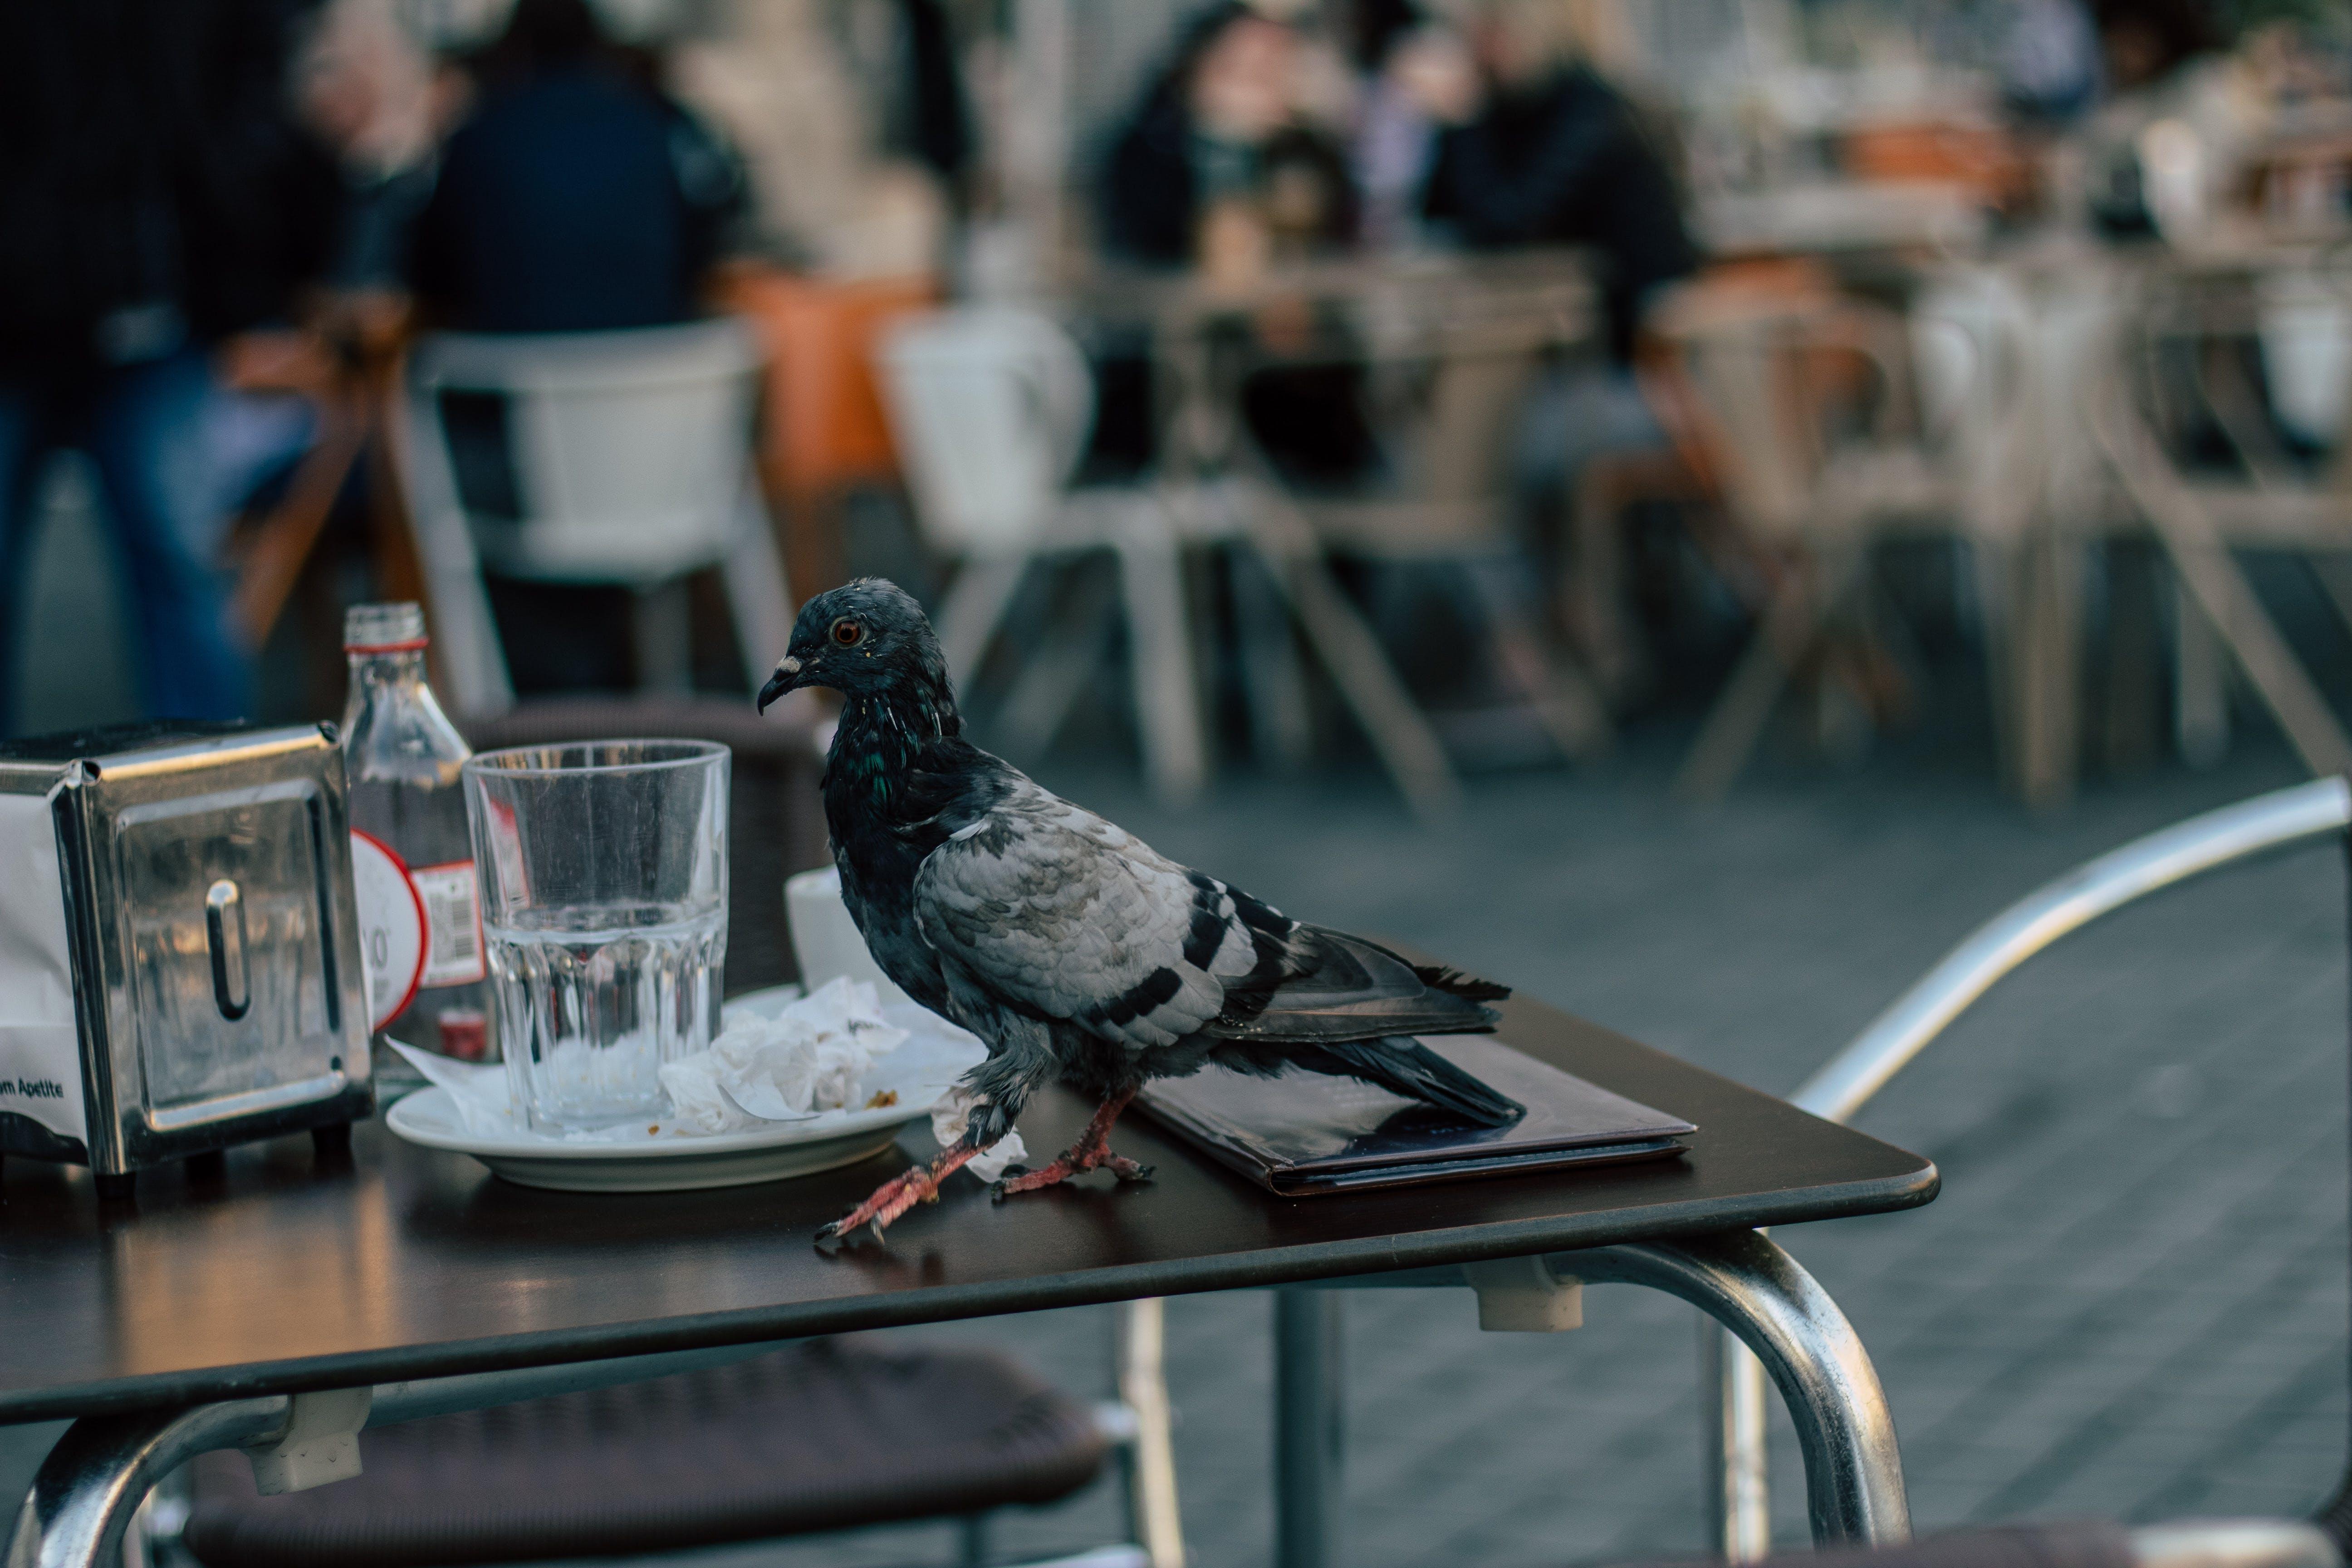 Foto d'estoc gratuïta de animal, au, aviari, colom